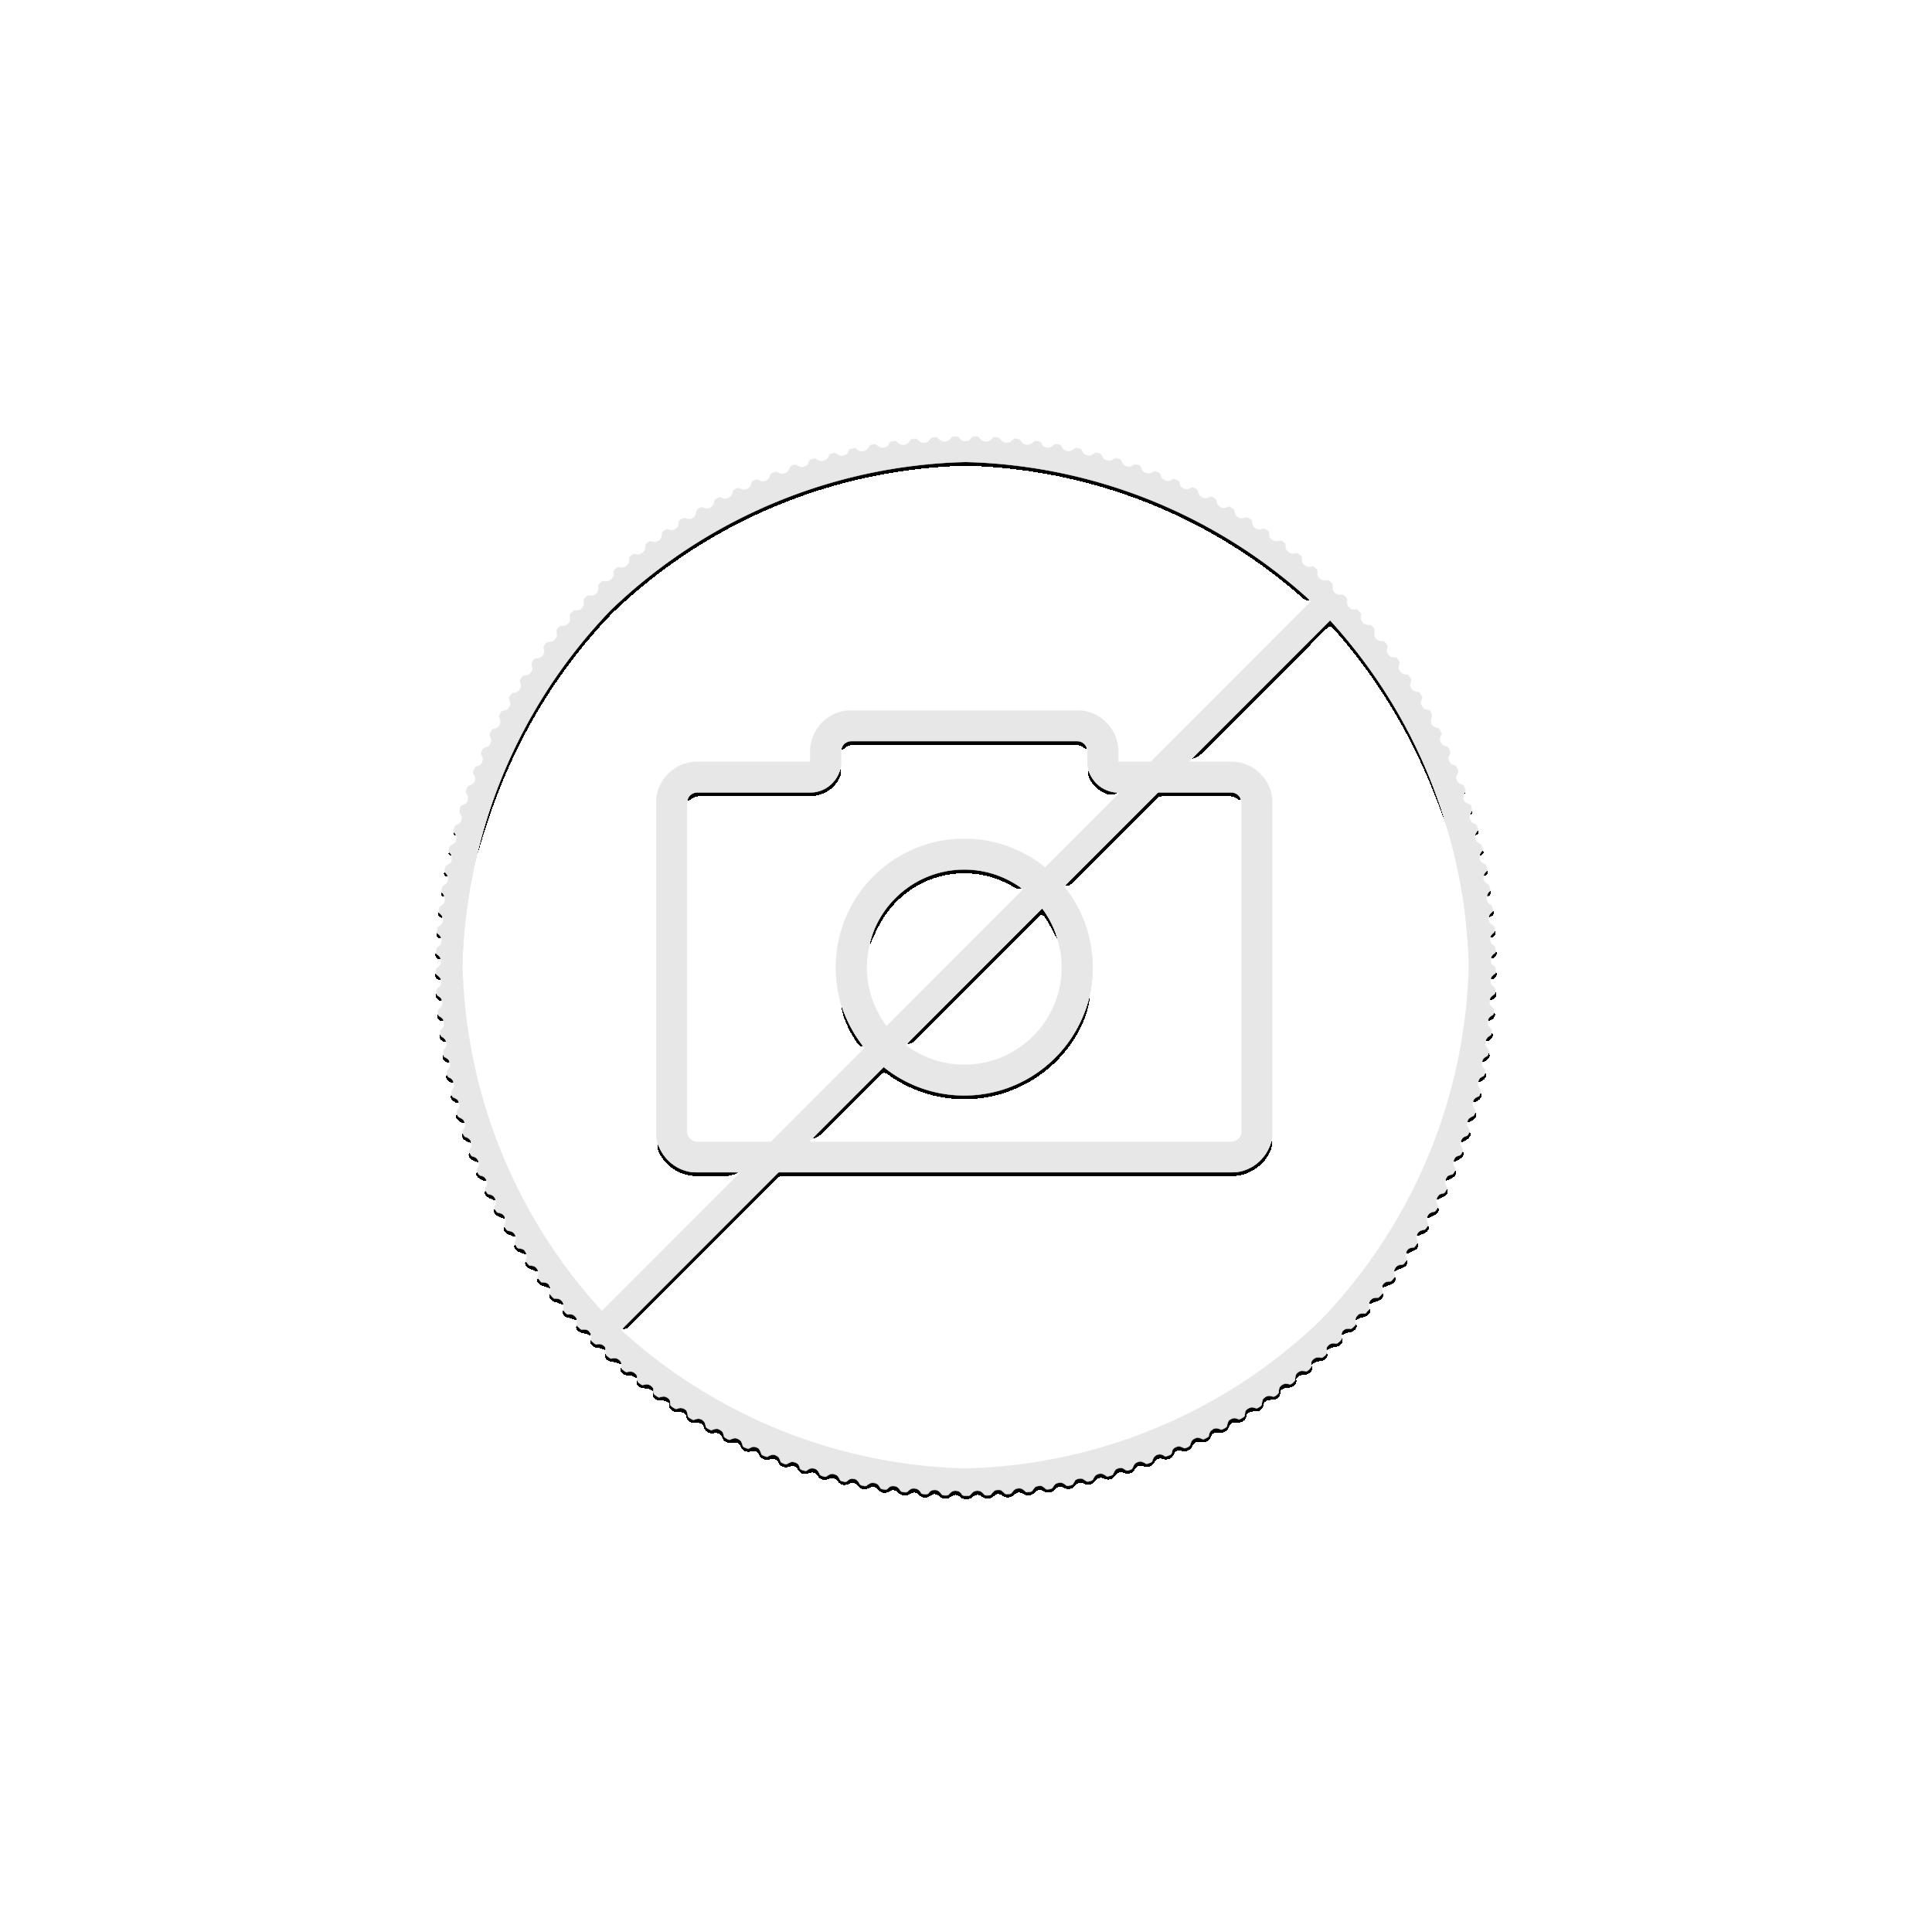 Nieuwe 1 troy ounce gouden Krugerrand 2020